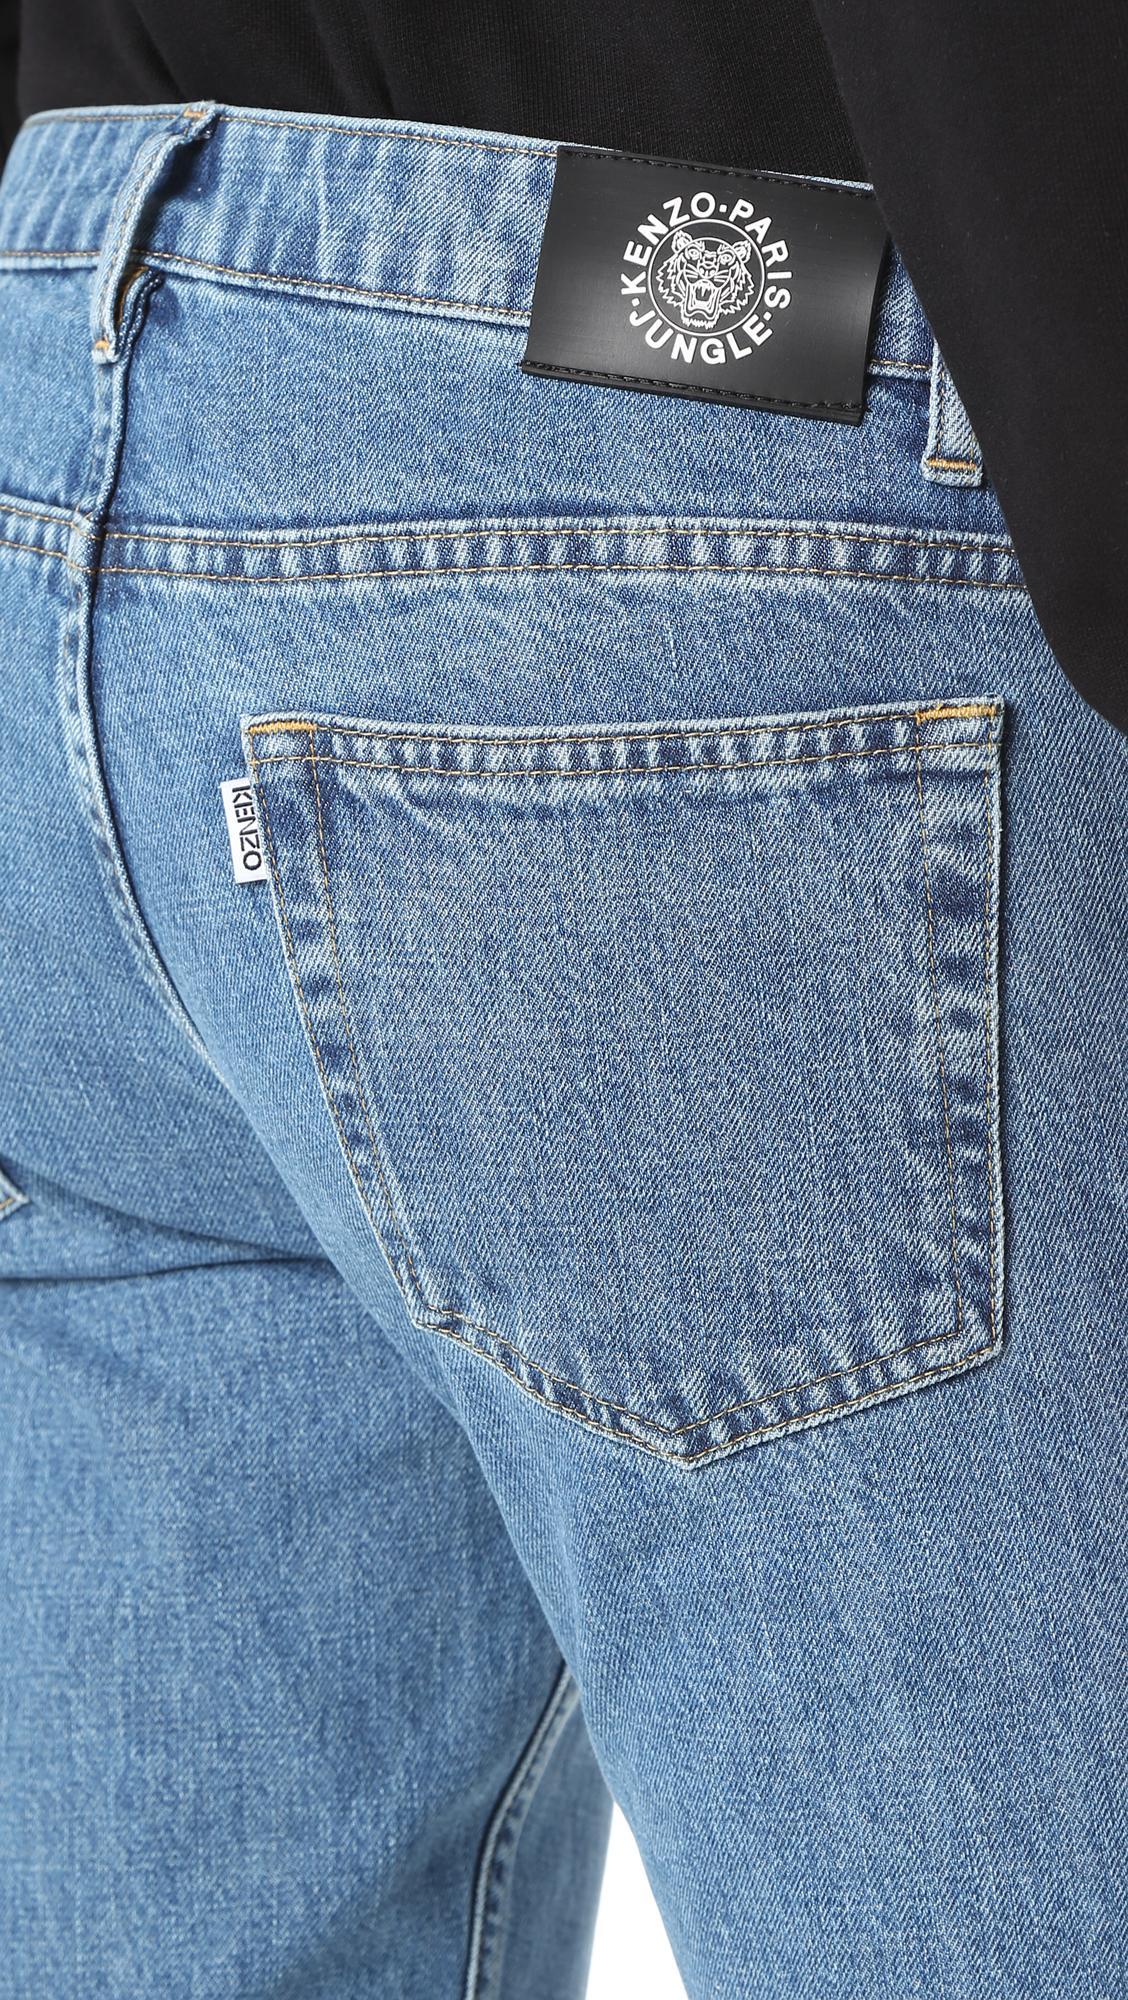 KENZO Denim Stonewashed Slim Jeans in Navy (Blue) for Men